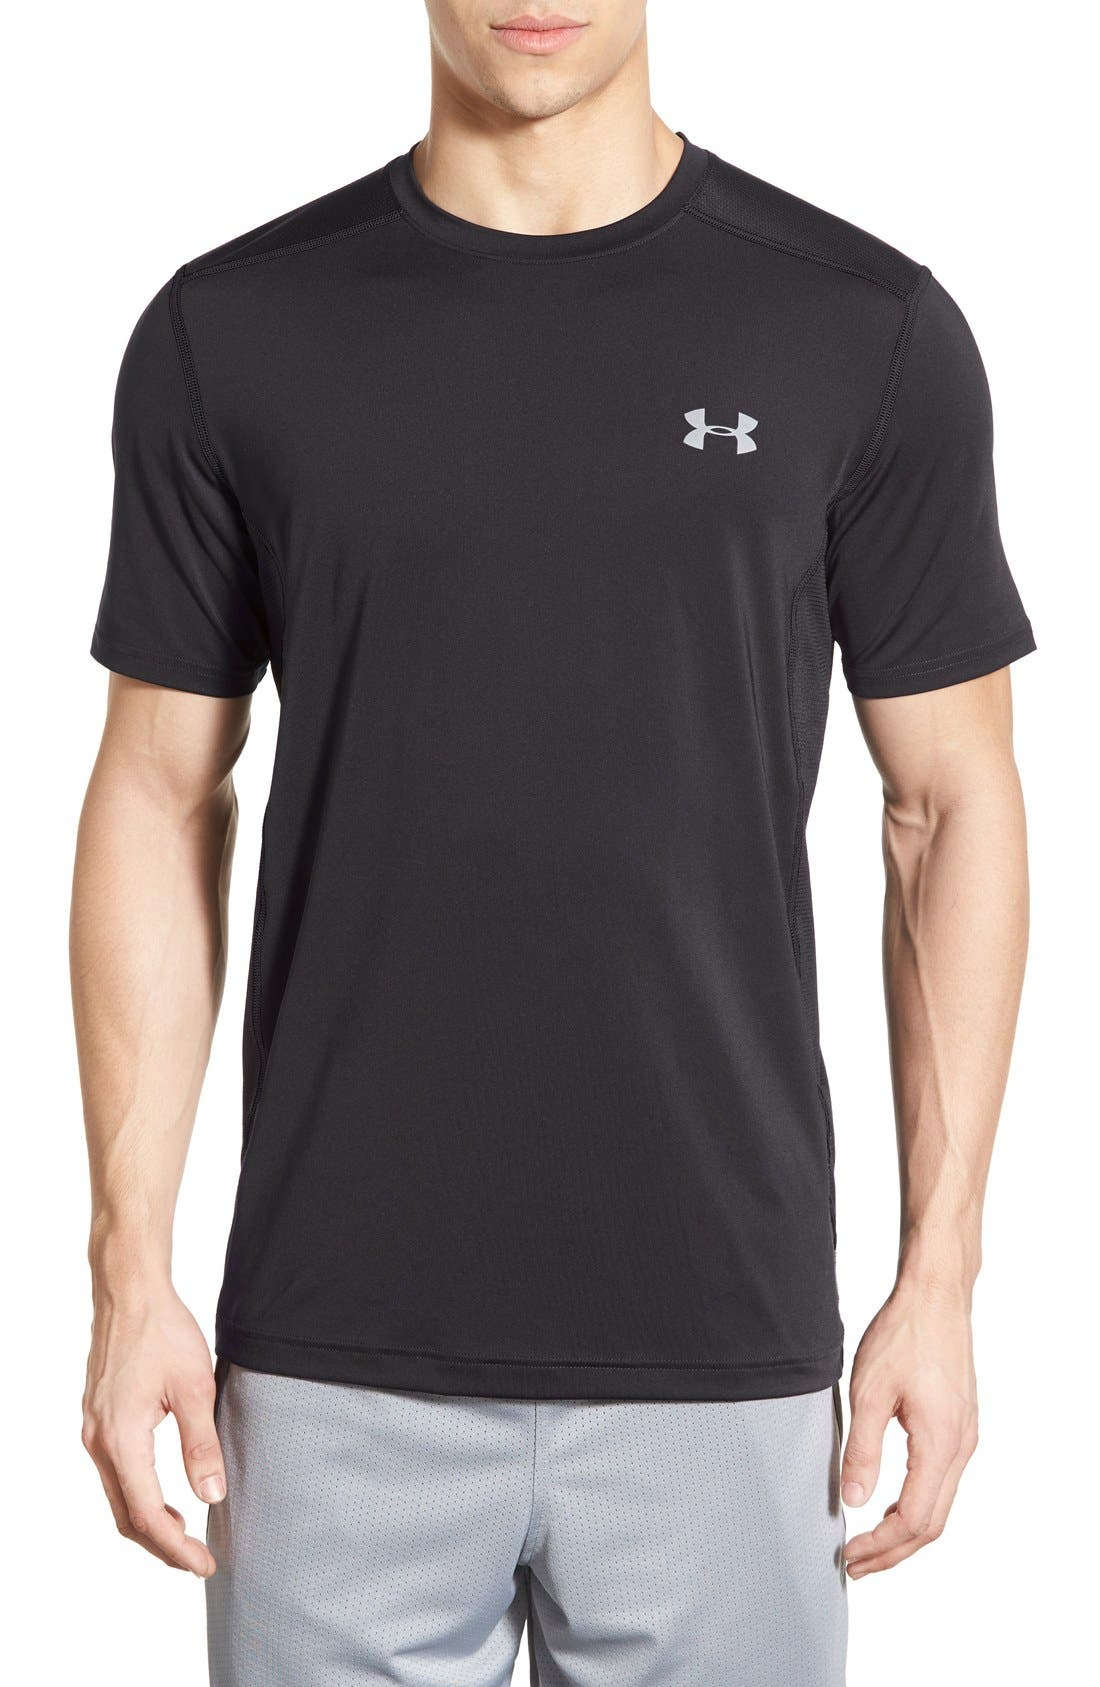 'Raid' HeatGear<sup>®</sup> Training T-Shirt,                             Main thumbnail 1, color,                             Black/ Black/ Graphite